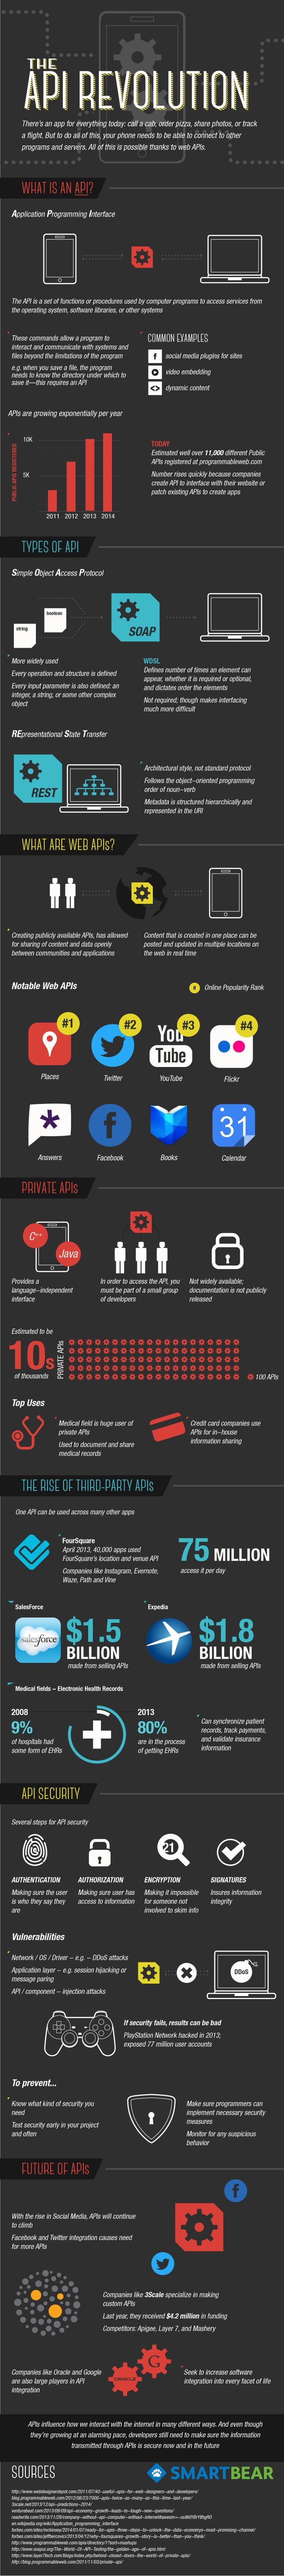 TECH - The Rise Of #API - #infographic #tech.